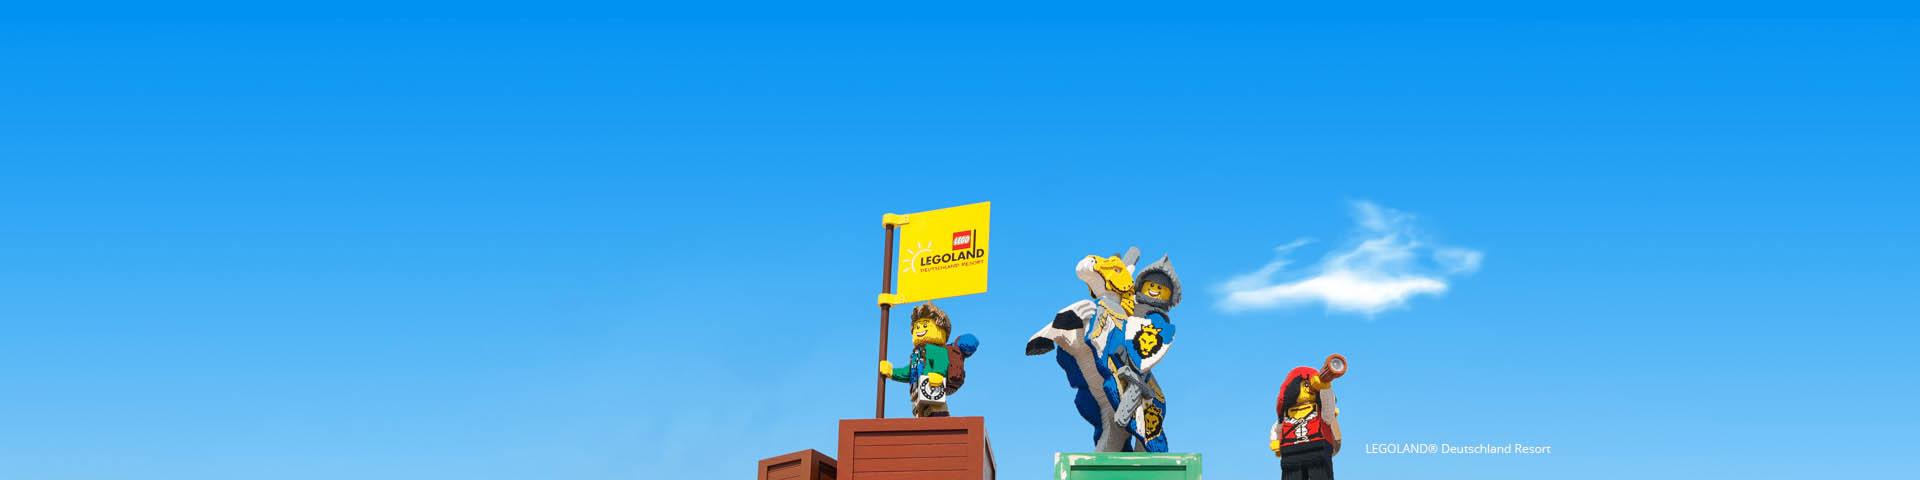 Poppetjes van Lego in Legoland